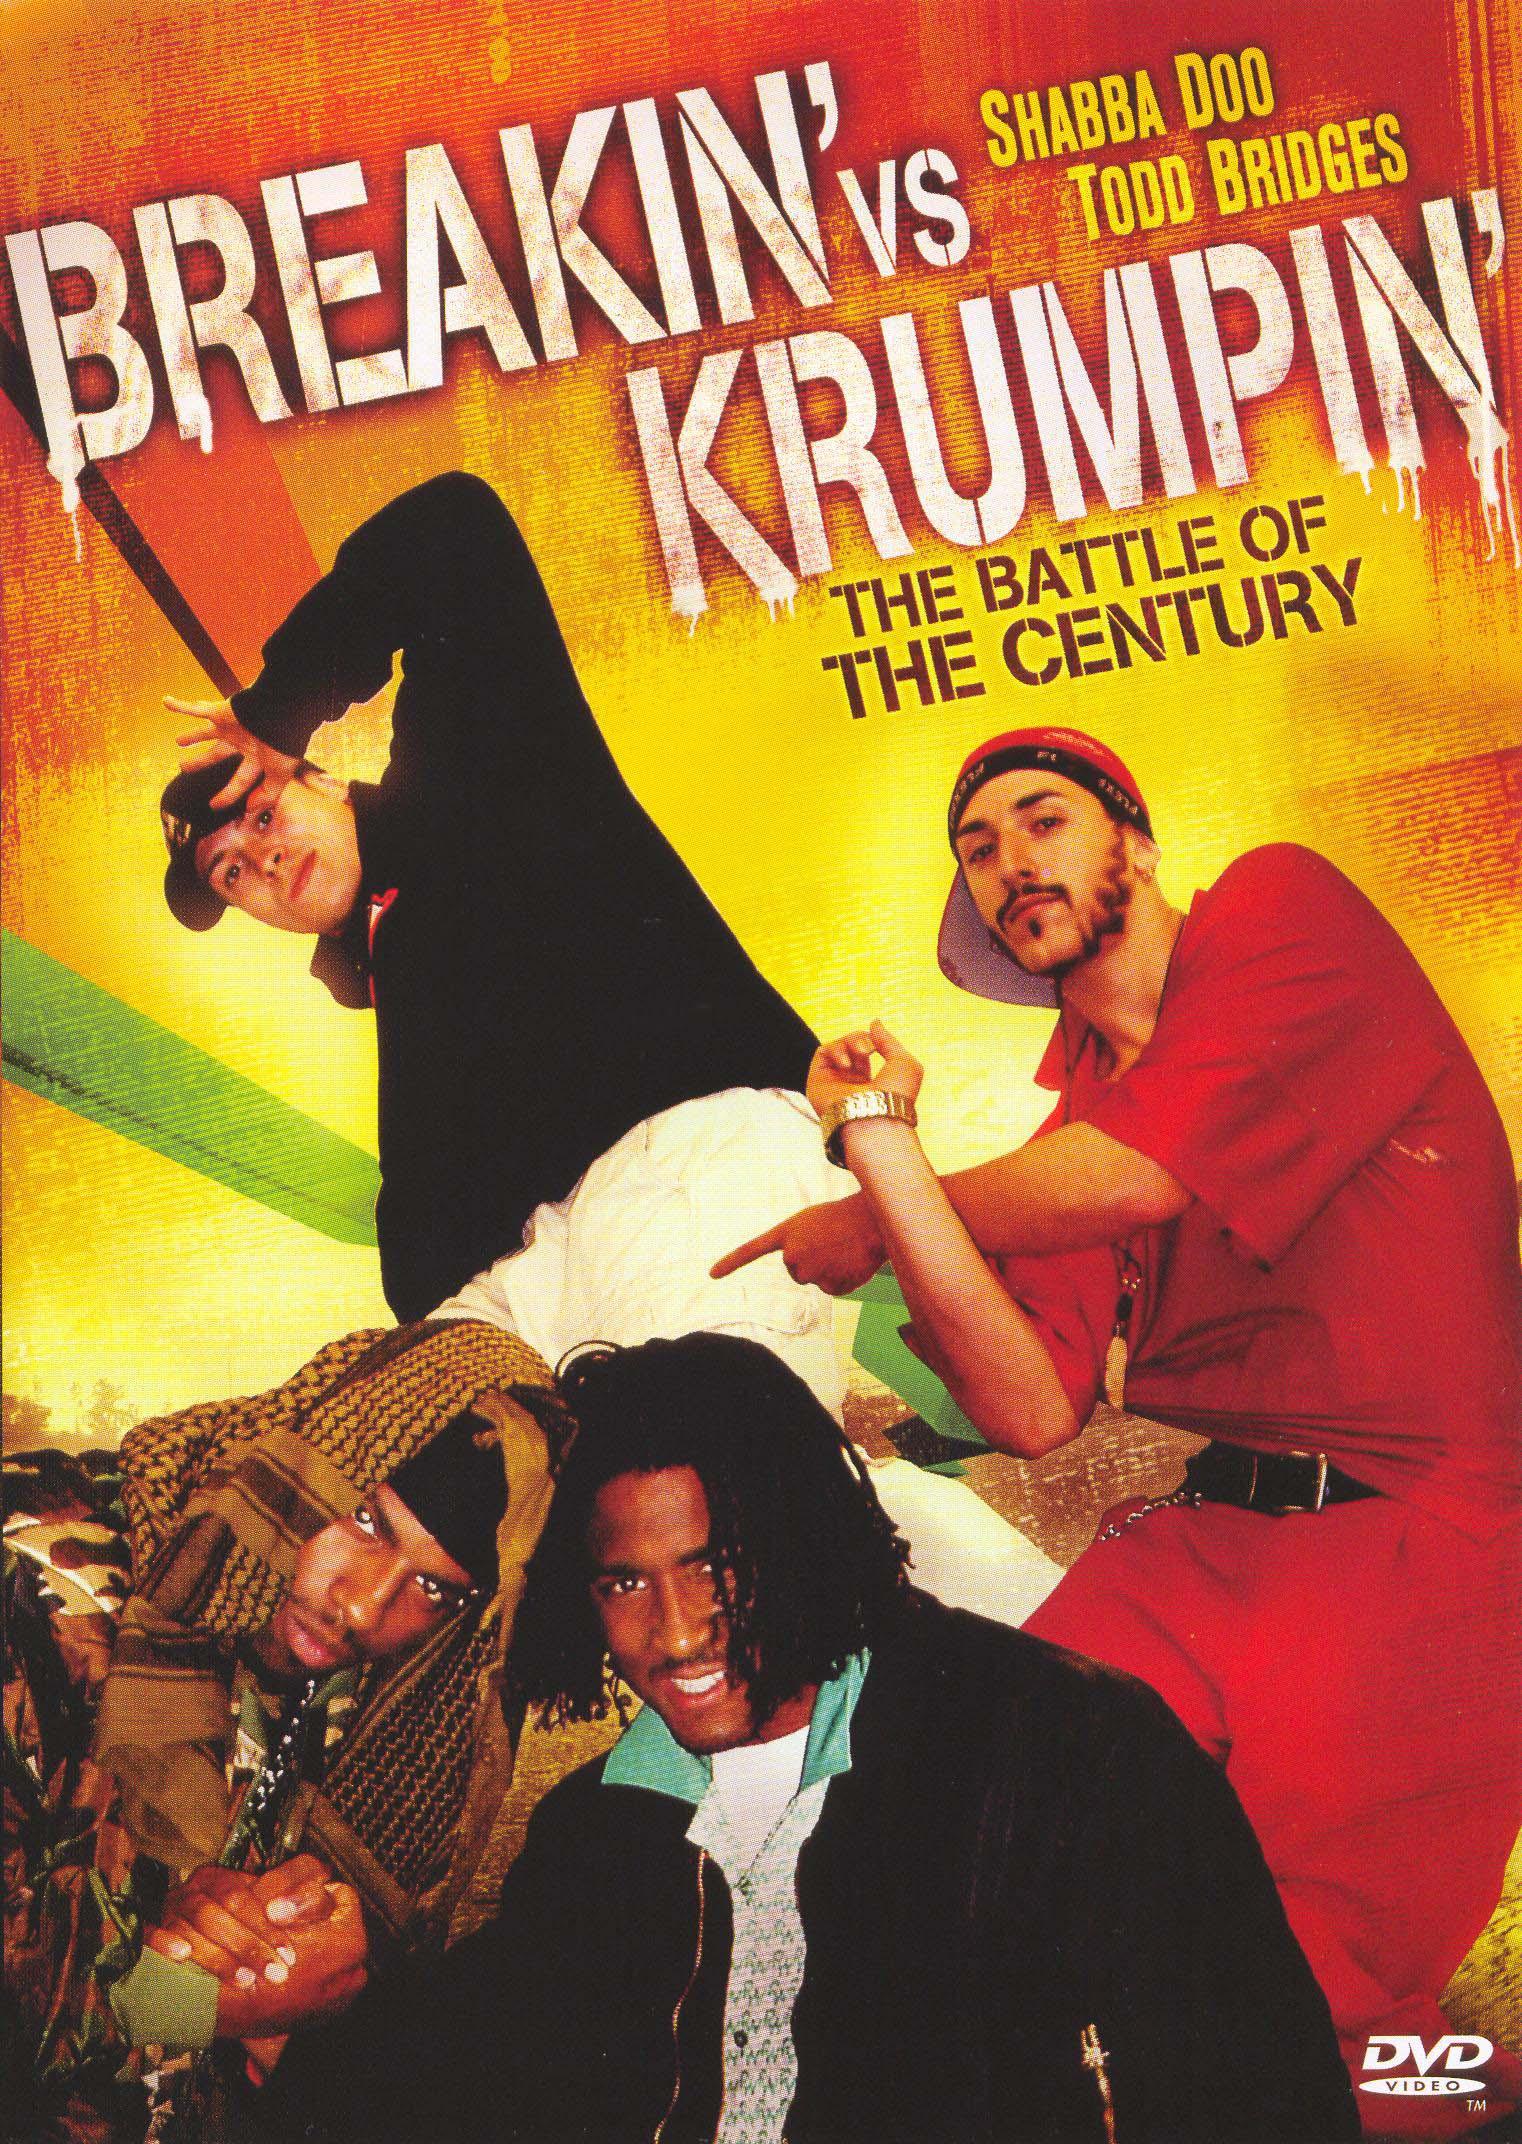 Breakin' vs. Krumpin'